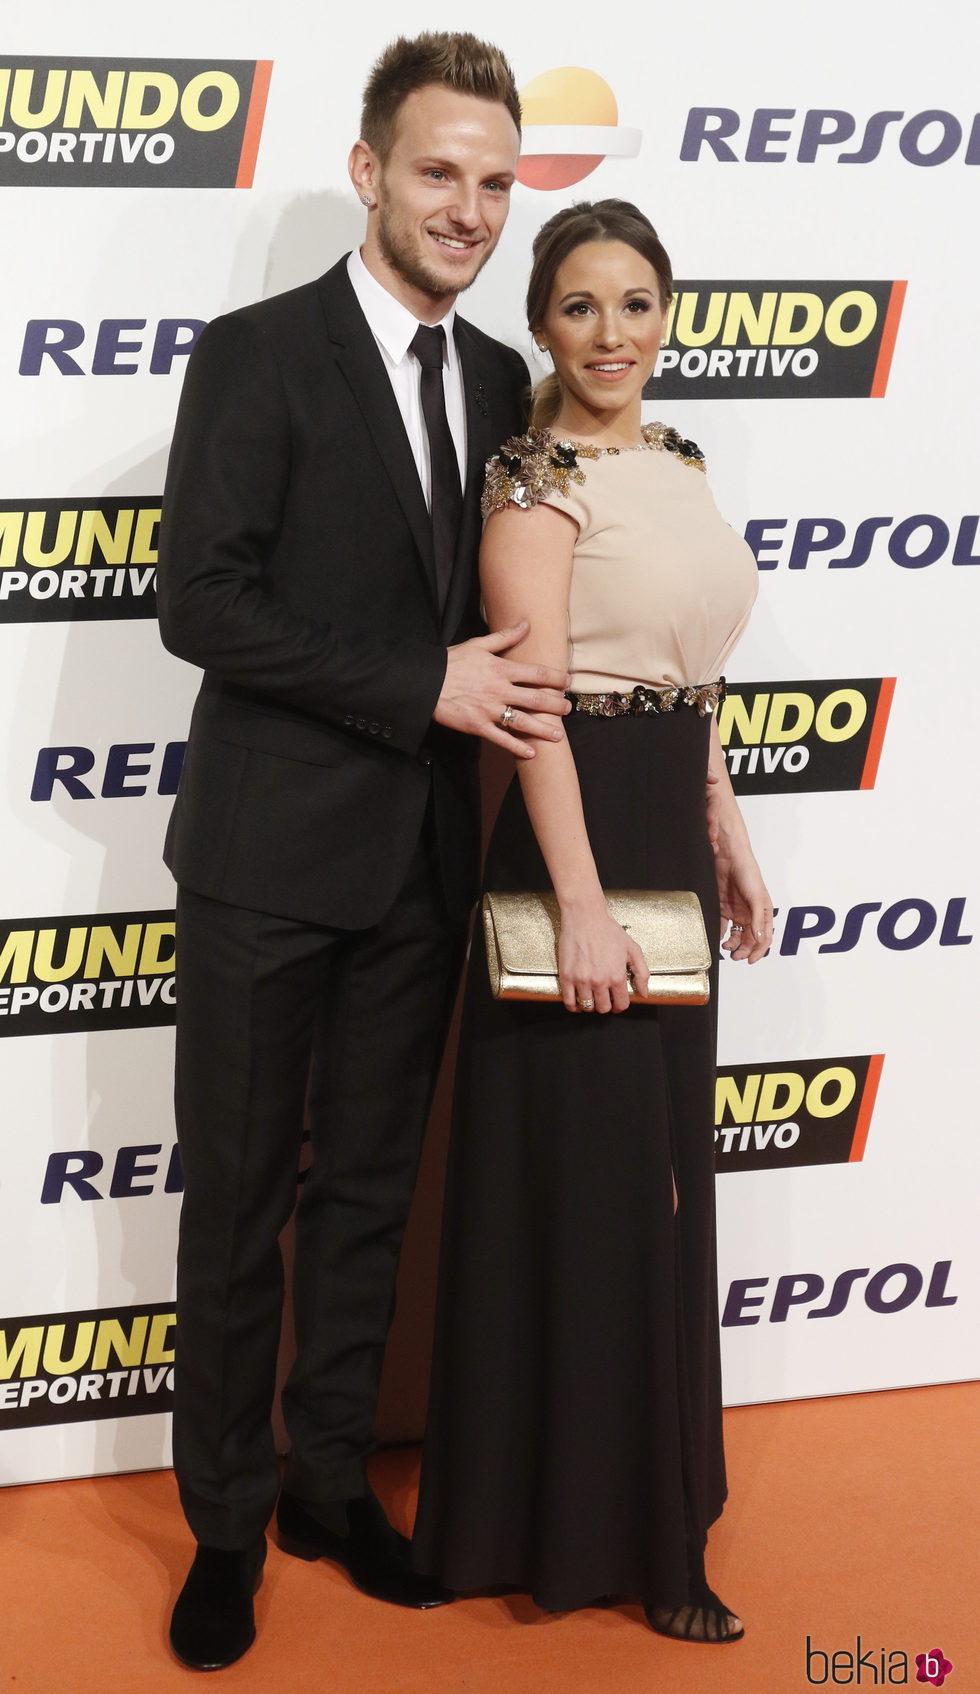 Ivan Rakitic y su pareja Raquel Mauri en la Gala Mundo Deportivo 2017